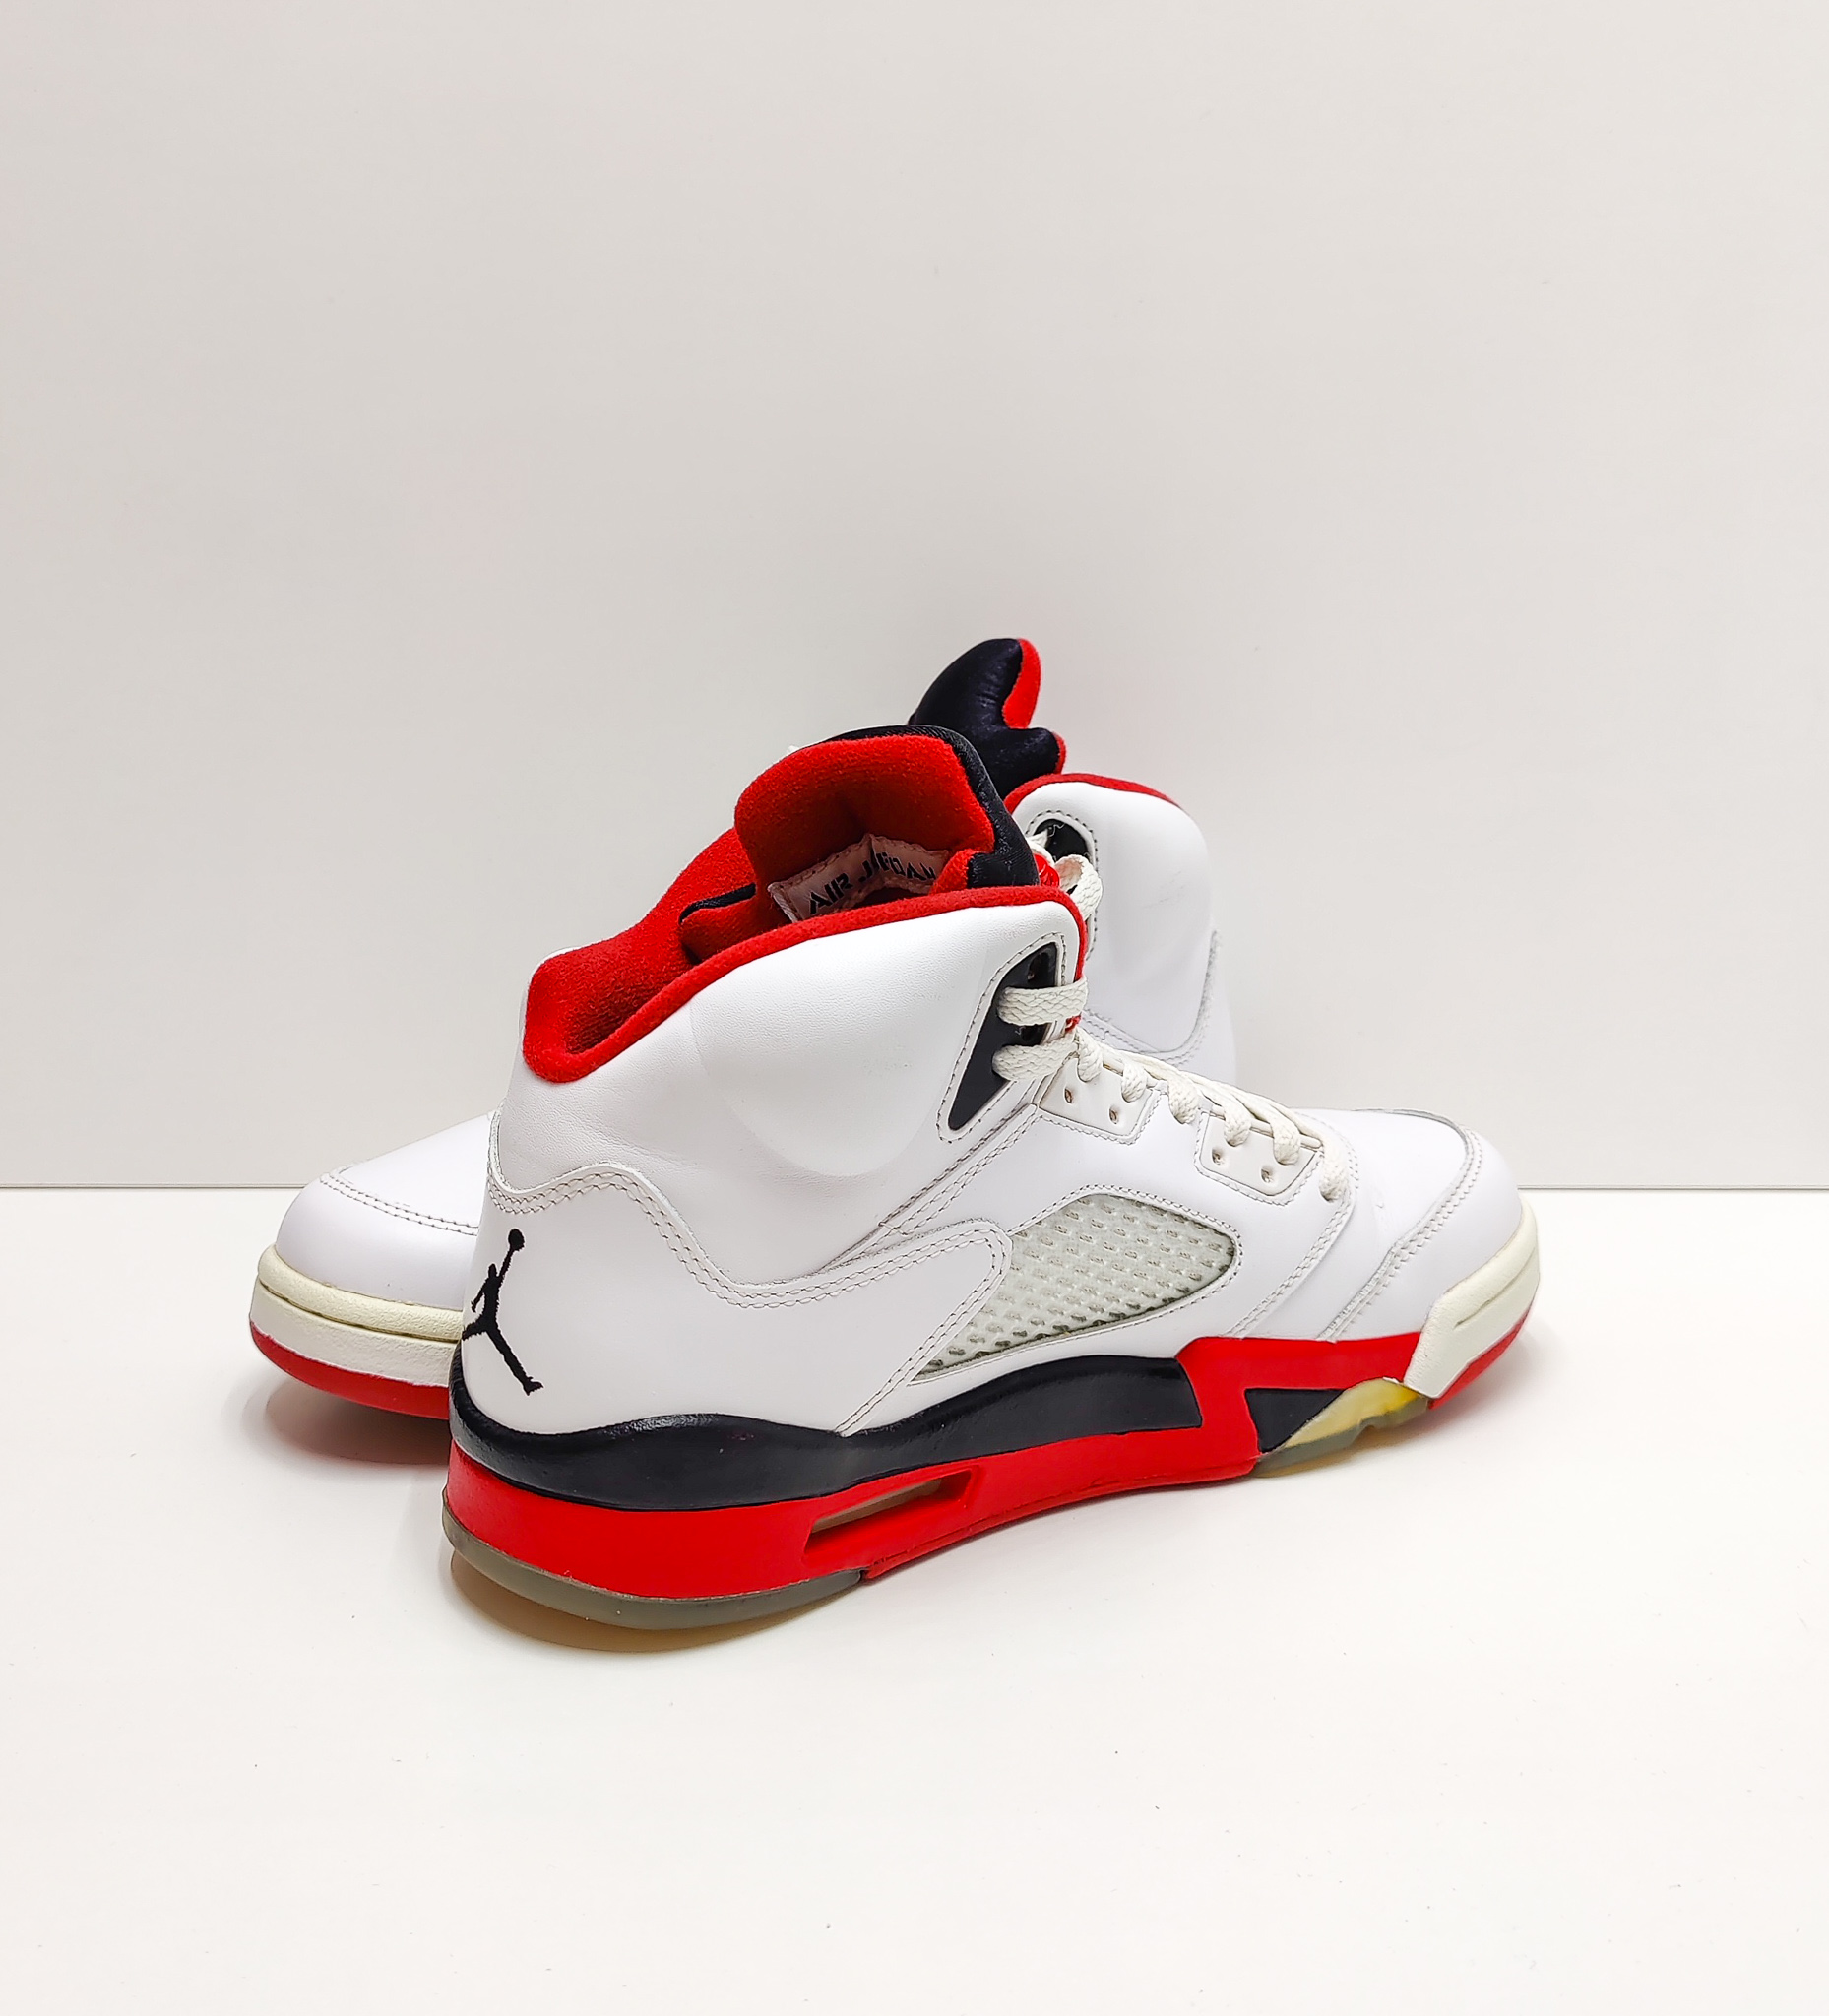 Jordan 5 fire red (2013)